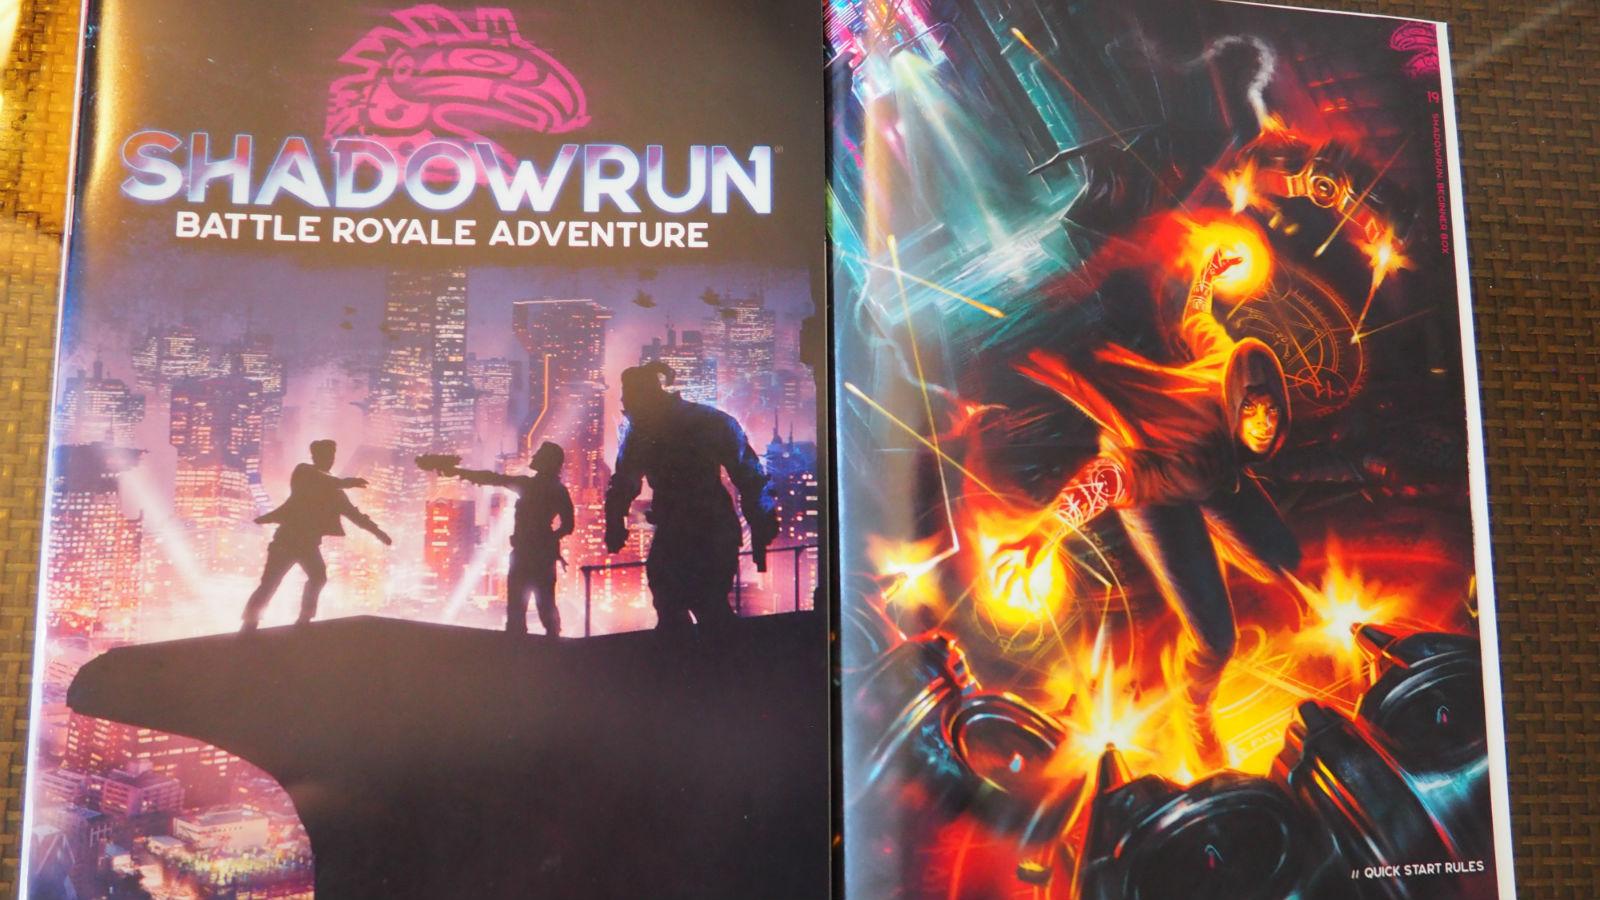 shadowrun sixth world battle royale